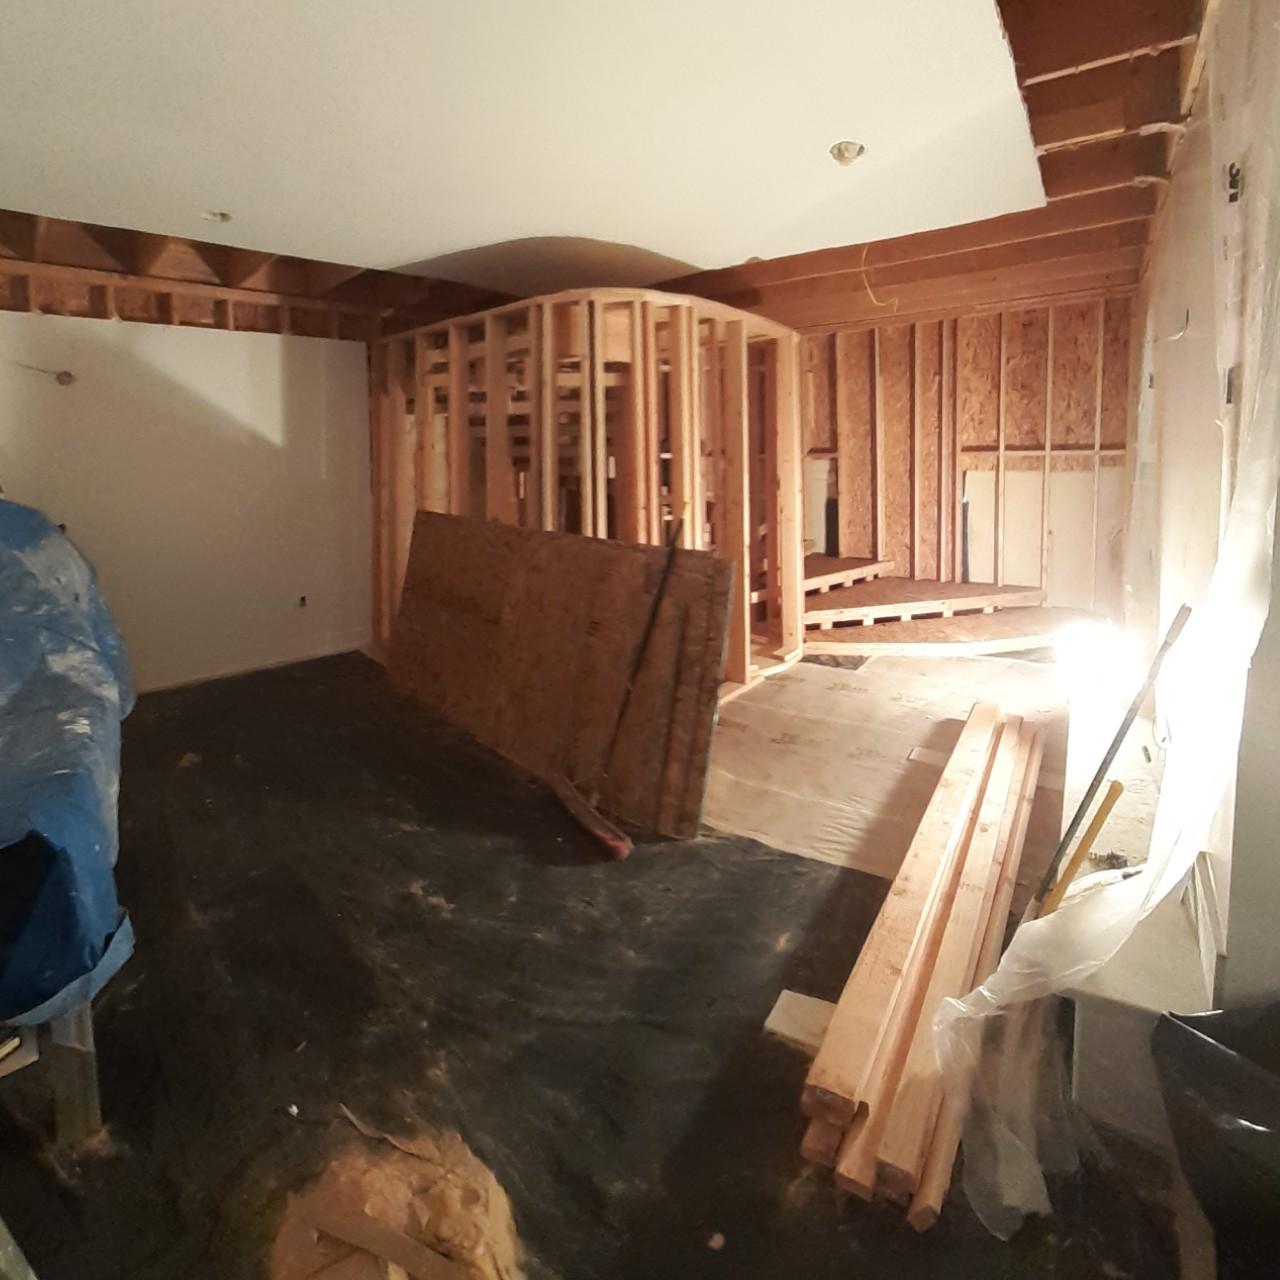 carpentry-wood-framing-second-floor-home-addition--framing-40